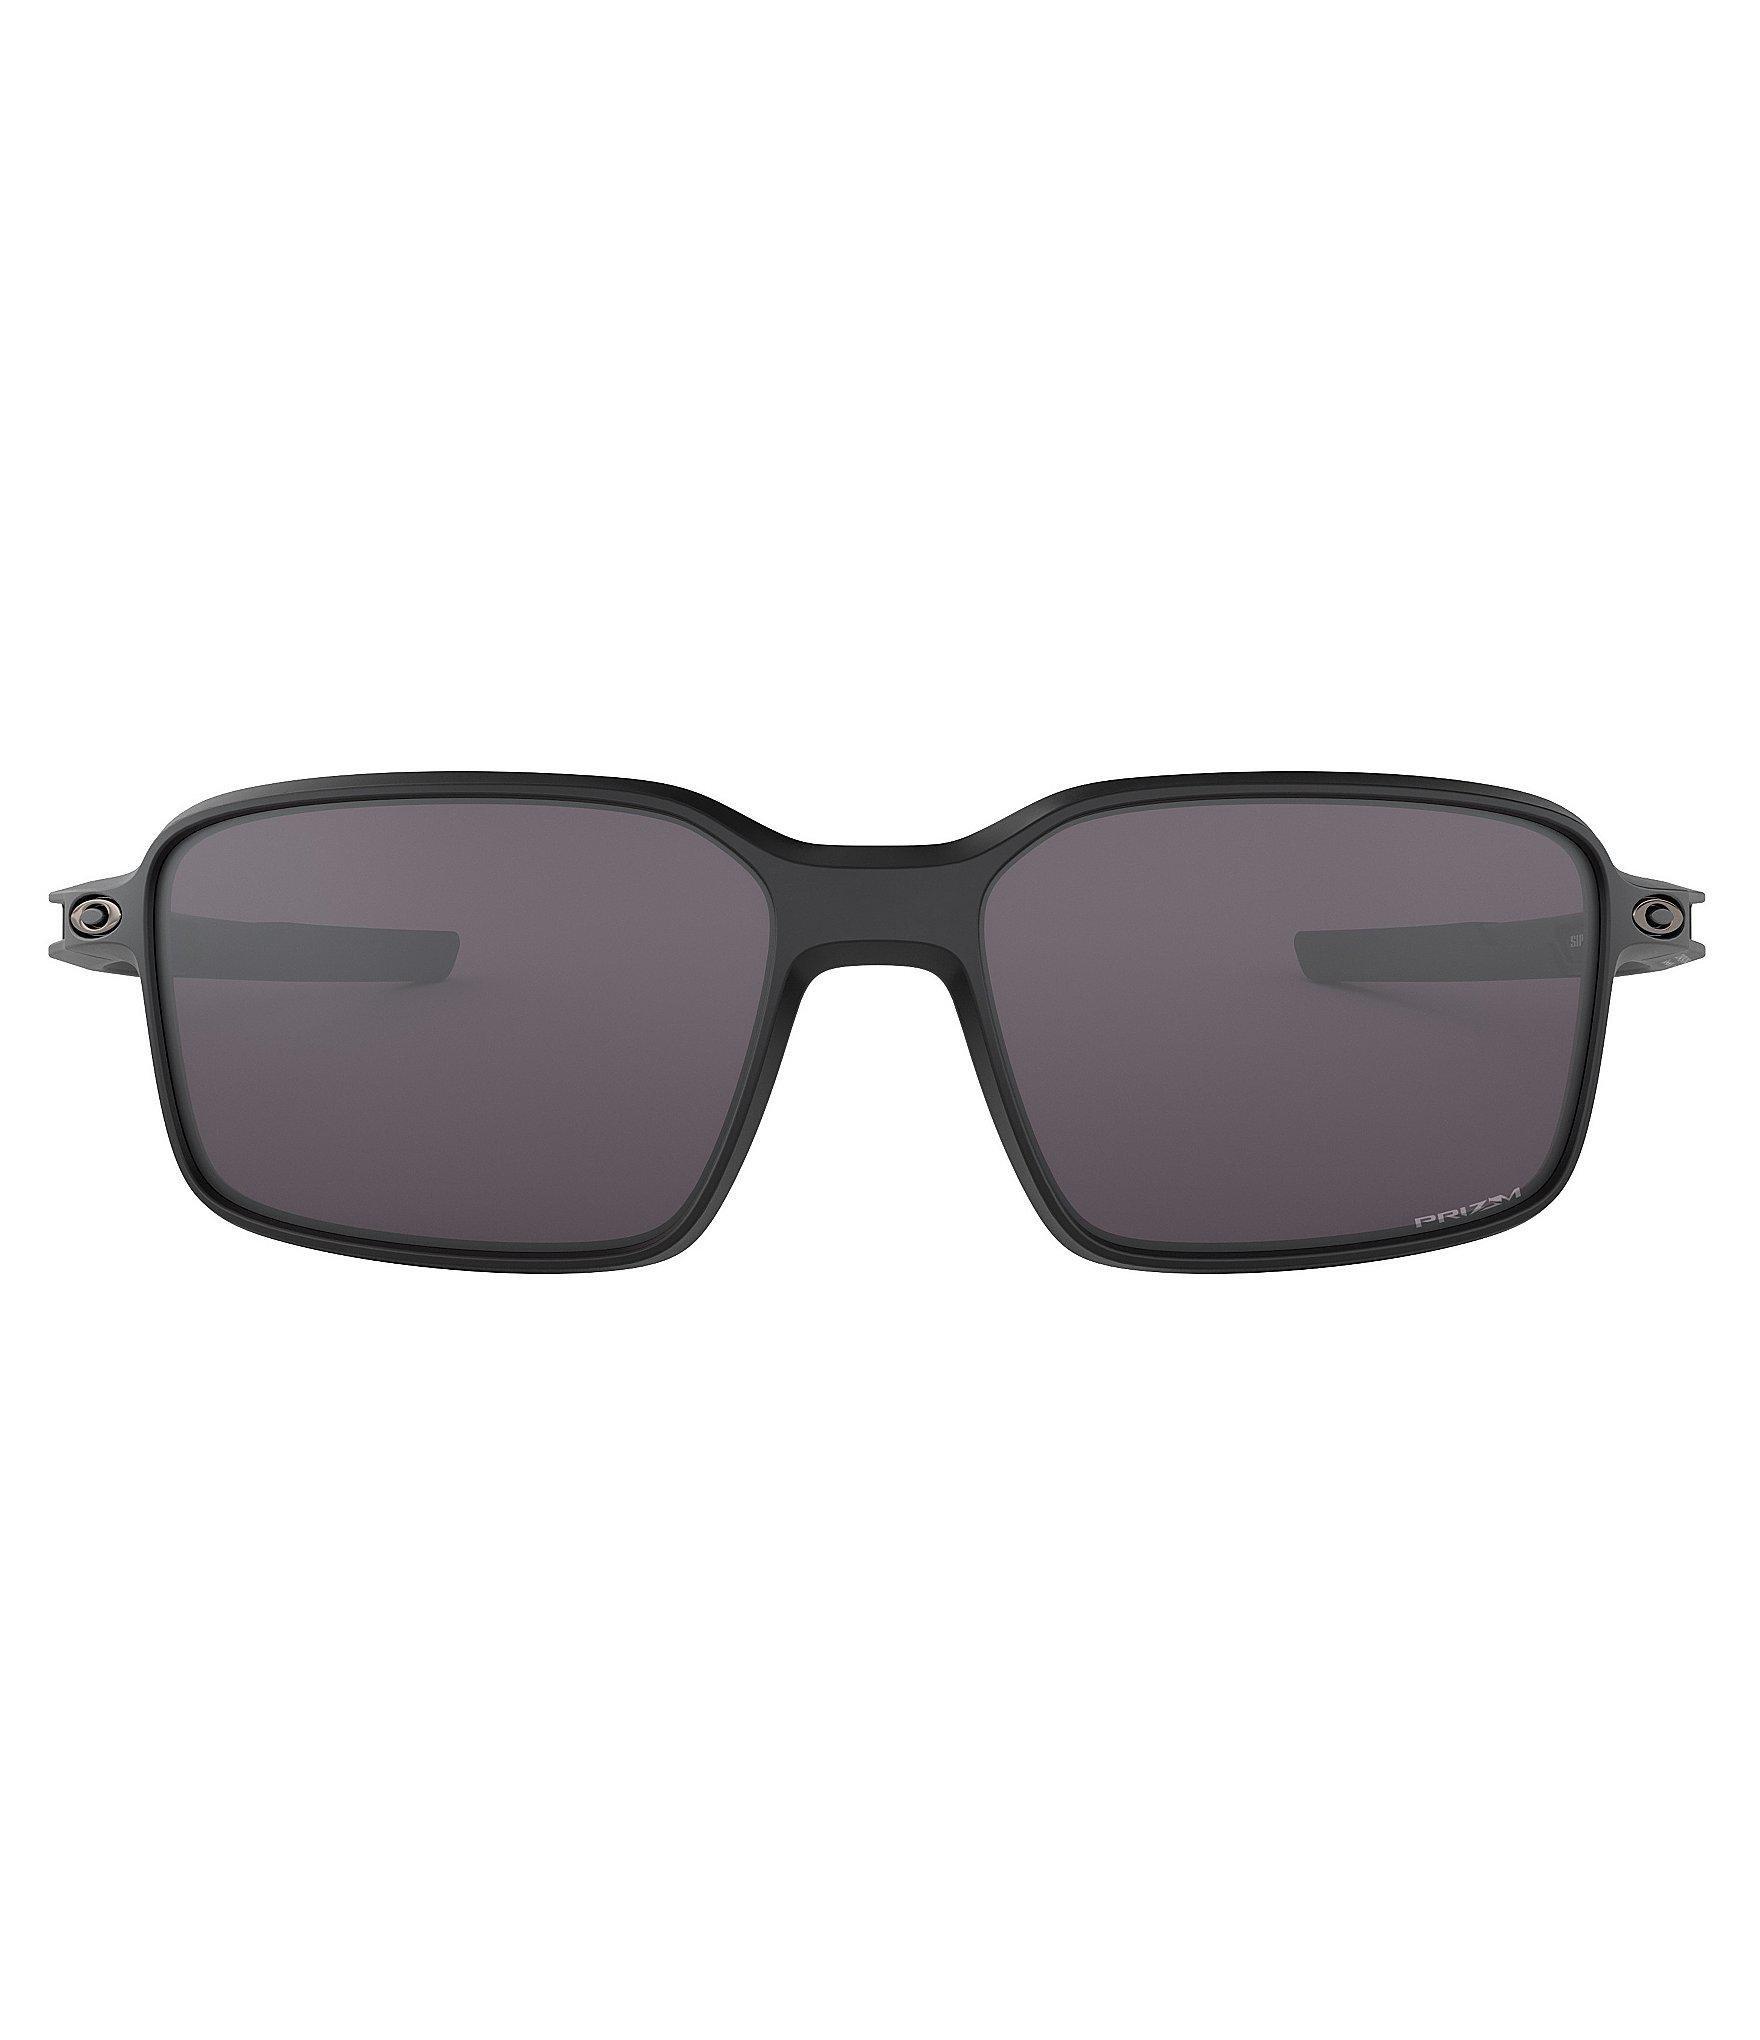 3bf6d62ab0184 Oakley - Black Siphon Sunglasses for Men - Lyst. View fullscreen